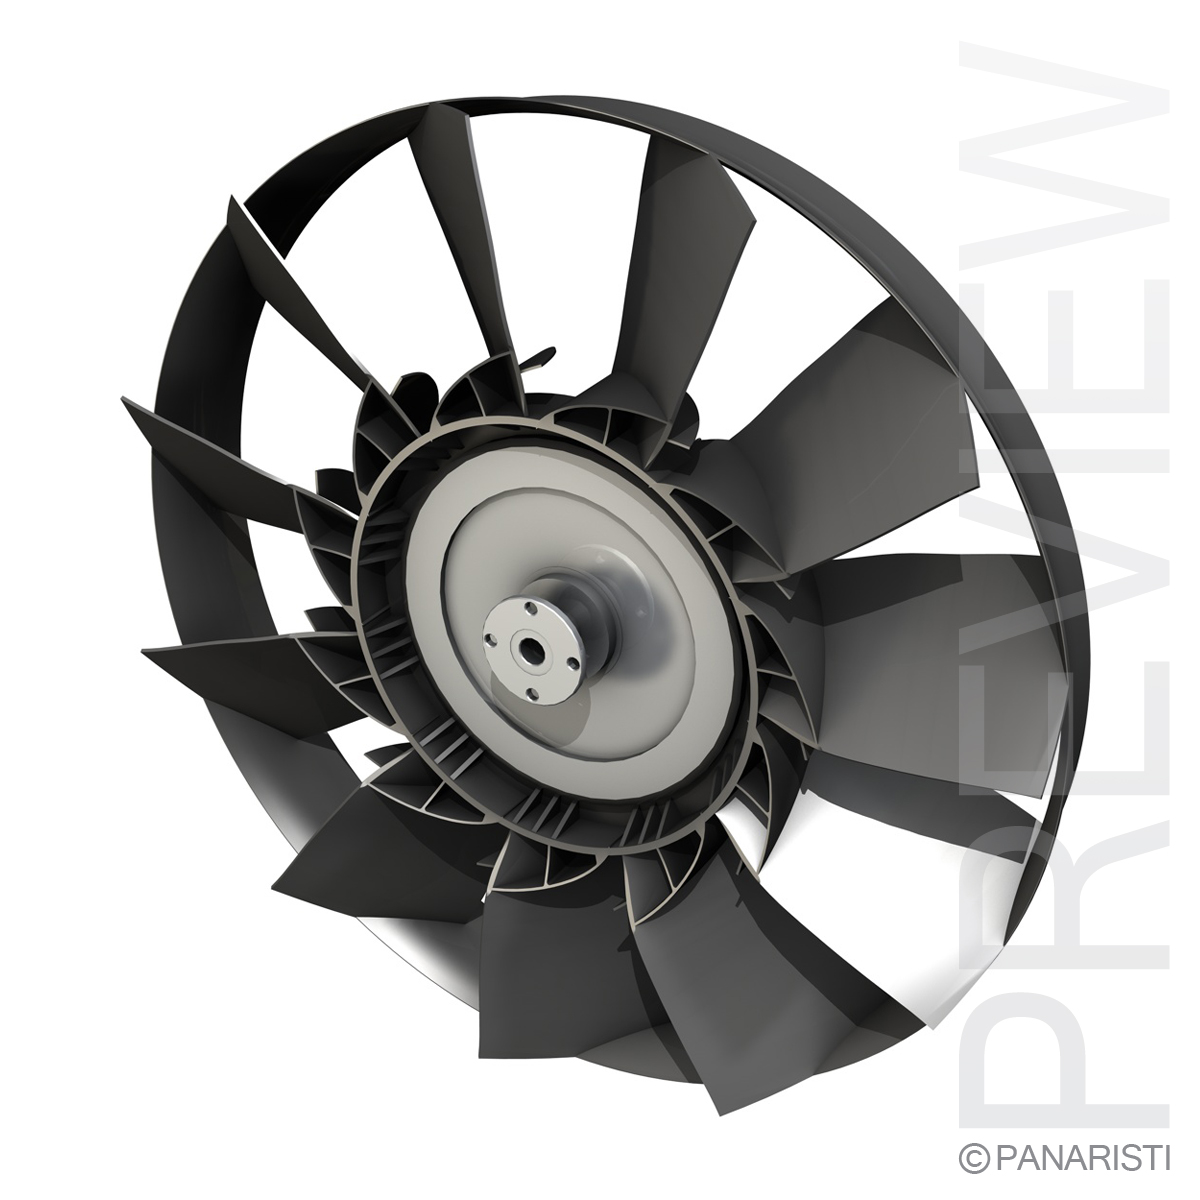 Engine cooling fan 2 3d model 3ds c4d lwo lws lw obj 129279